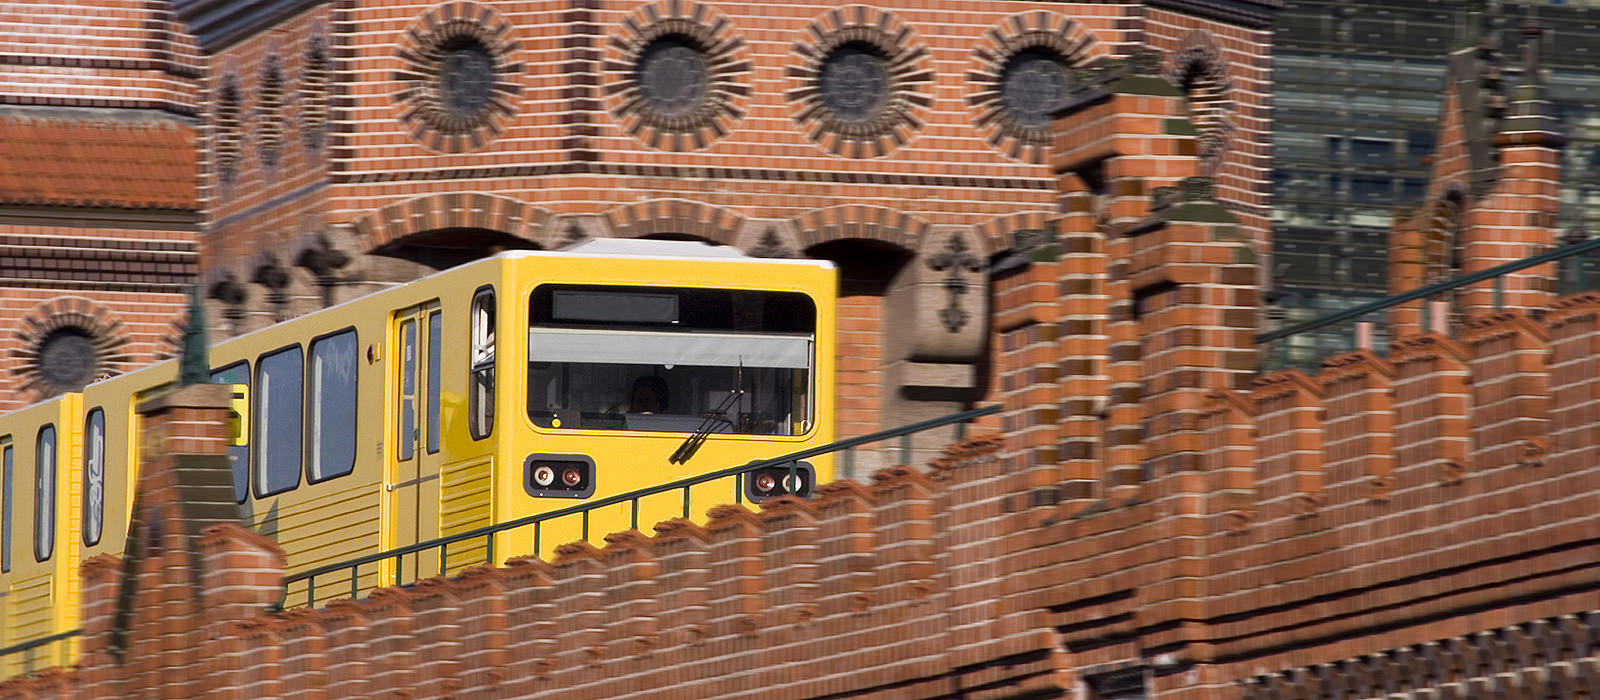 Dentallabor-Mehlhorn-Zahntechniker-Berlin-Slider-Kontakt